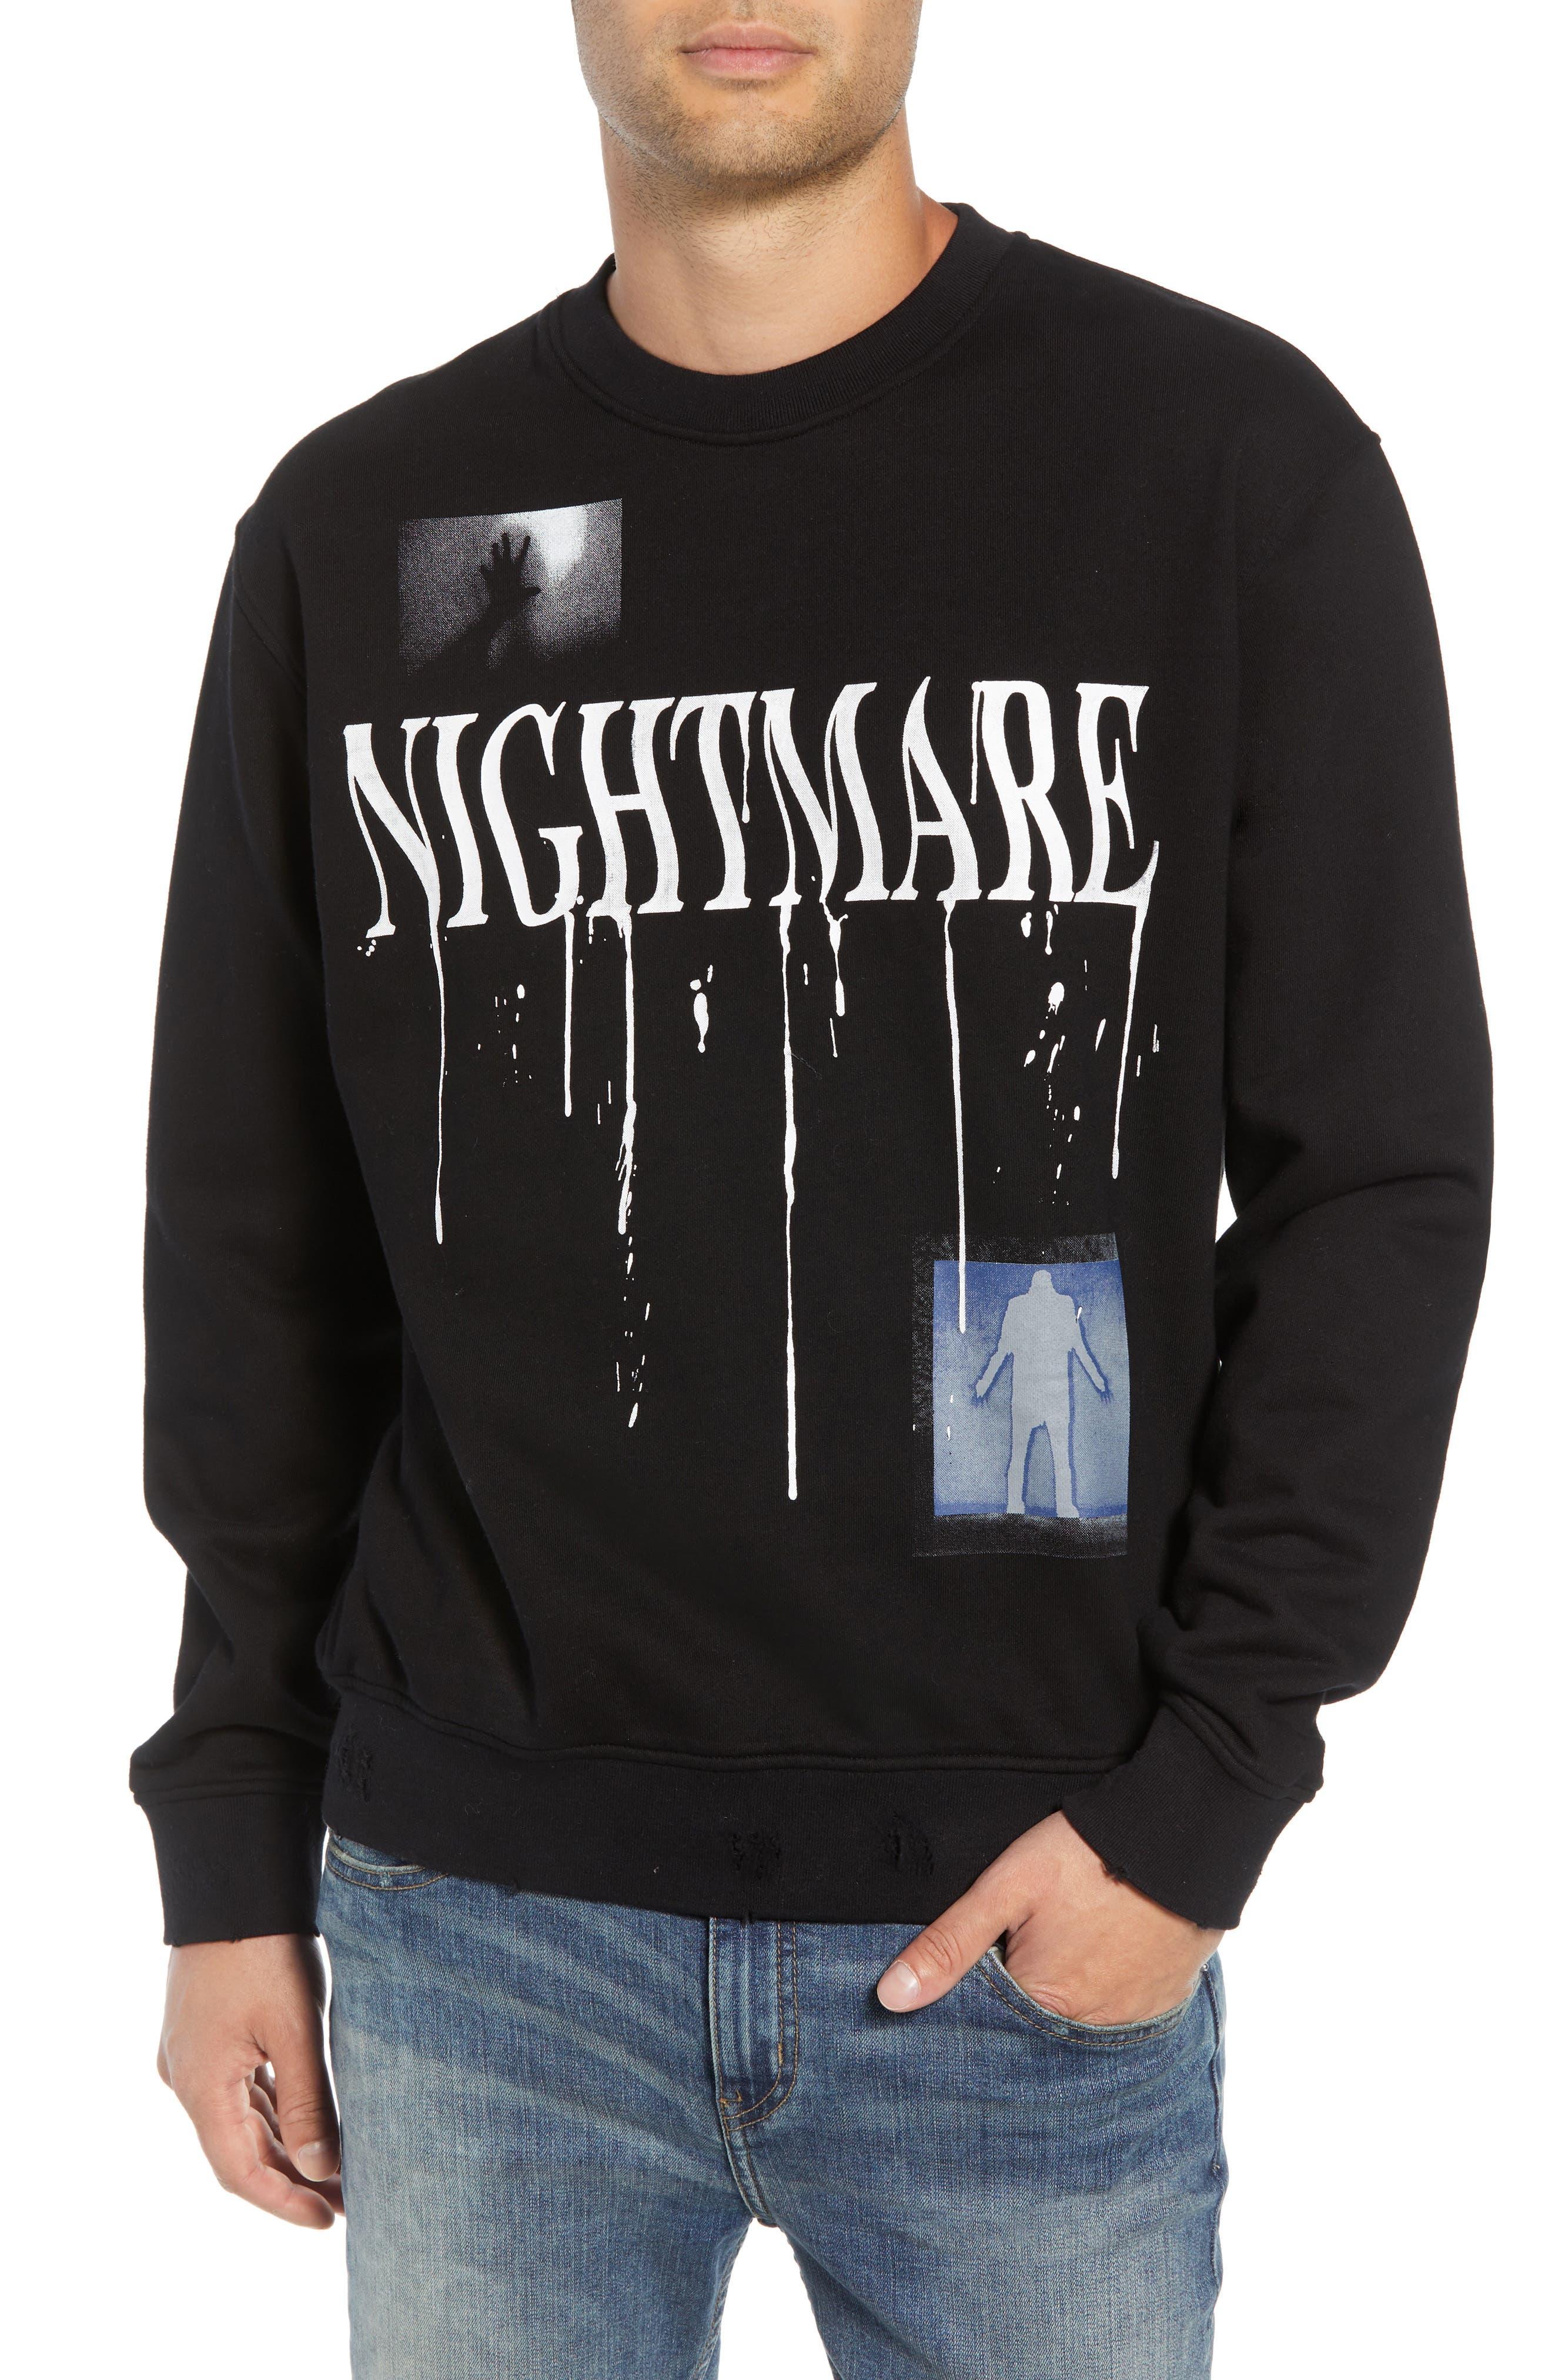 Nightmare Graphic Distressed Sweatshirt,                             Main thumbnail 1, color,                             BLACK